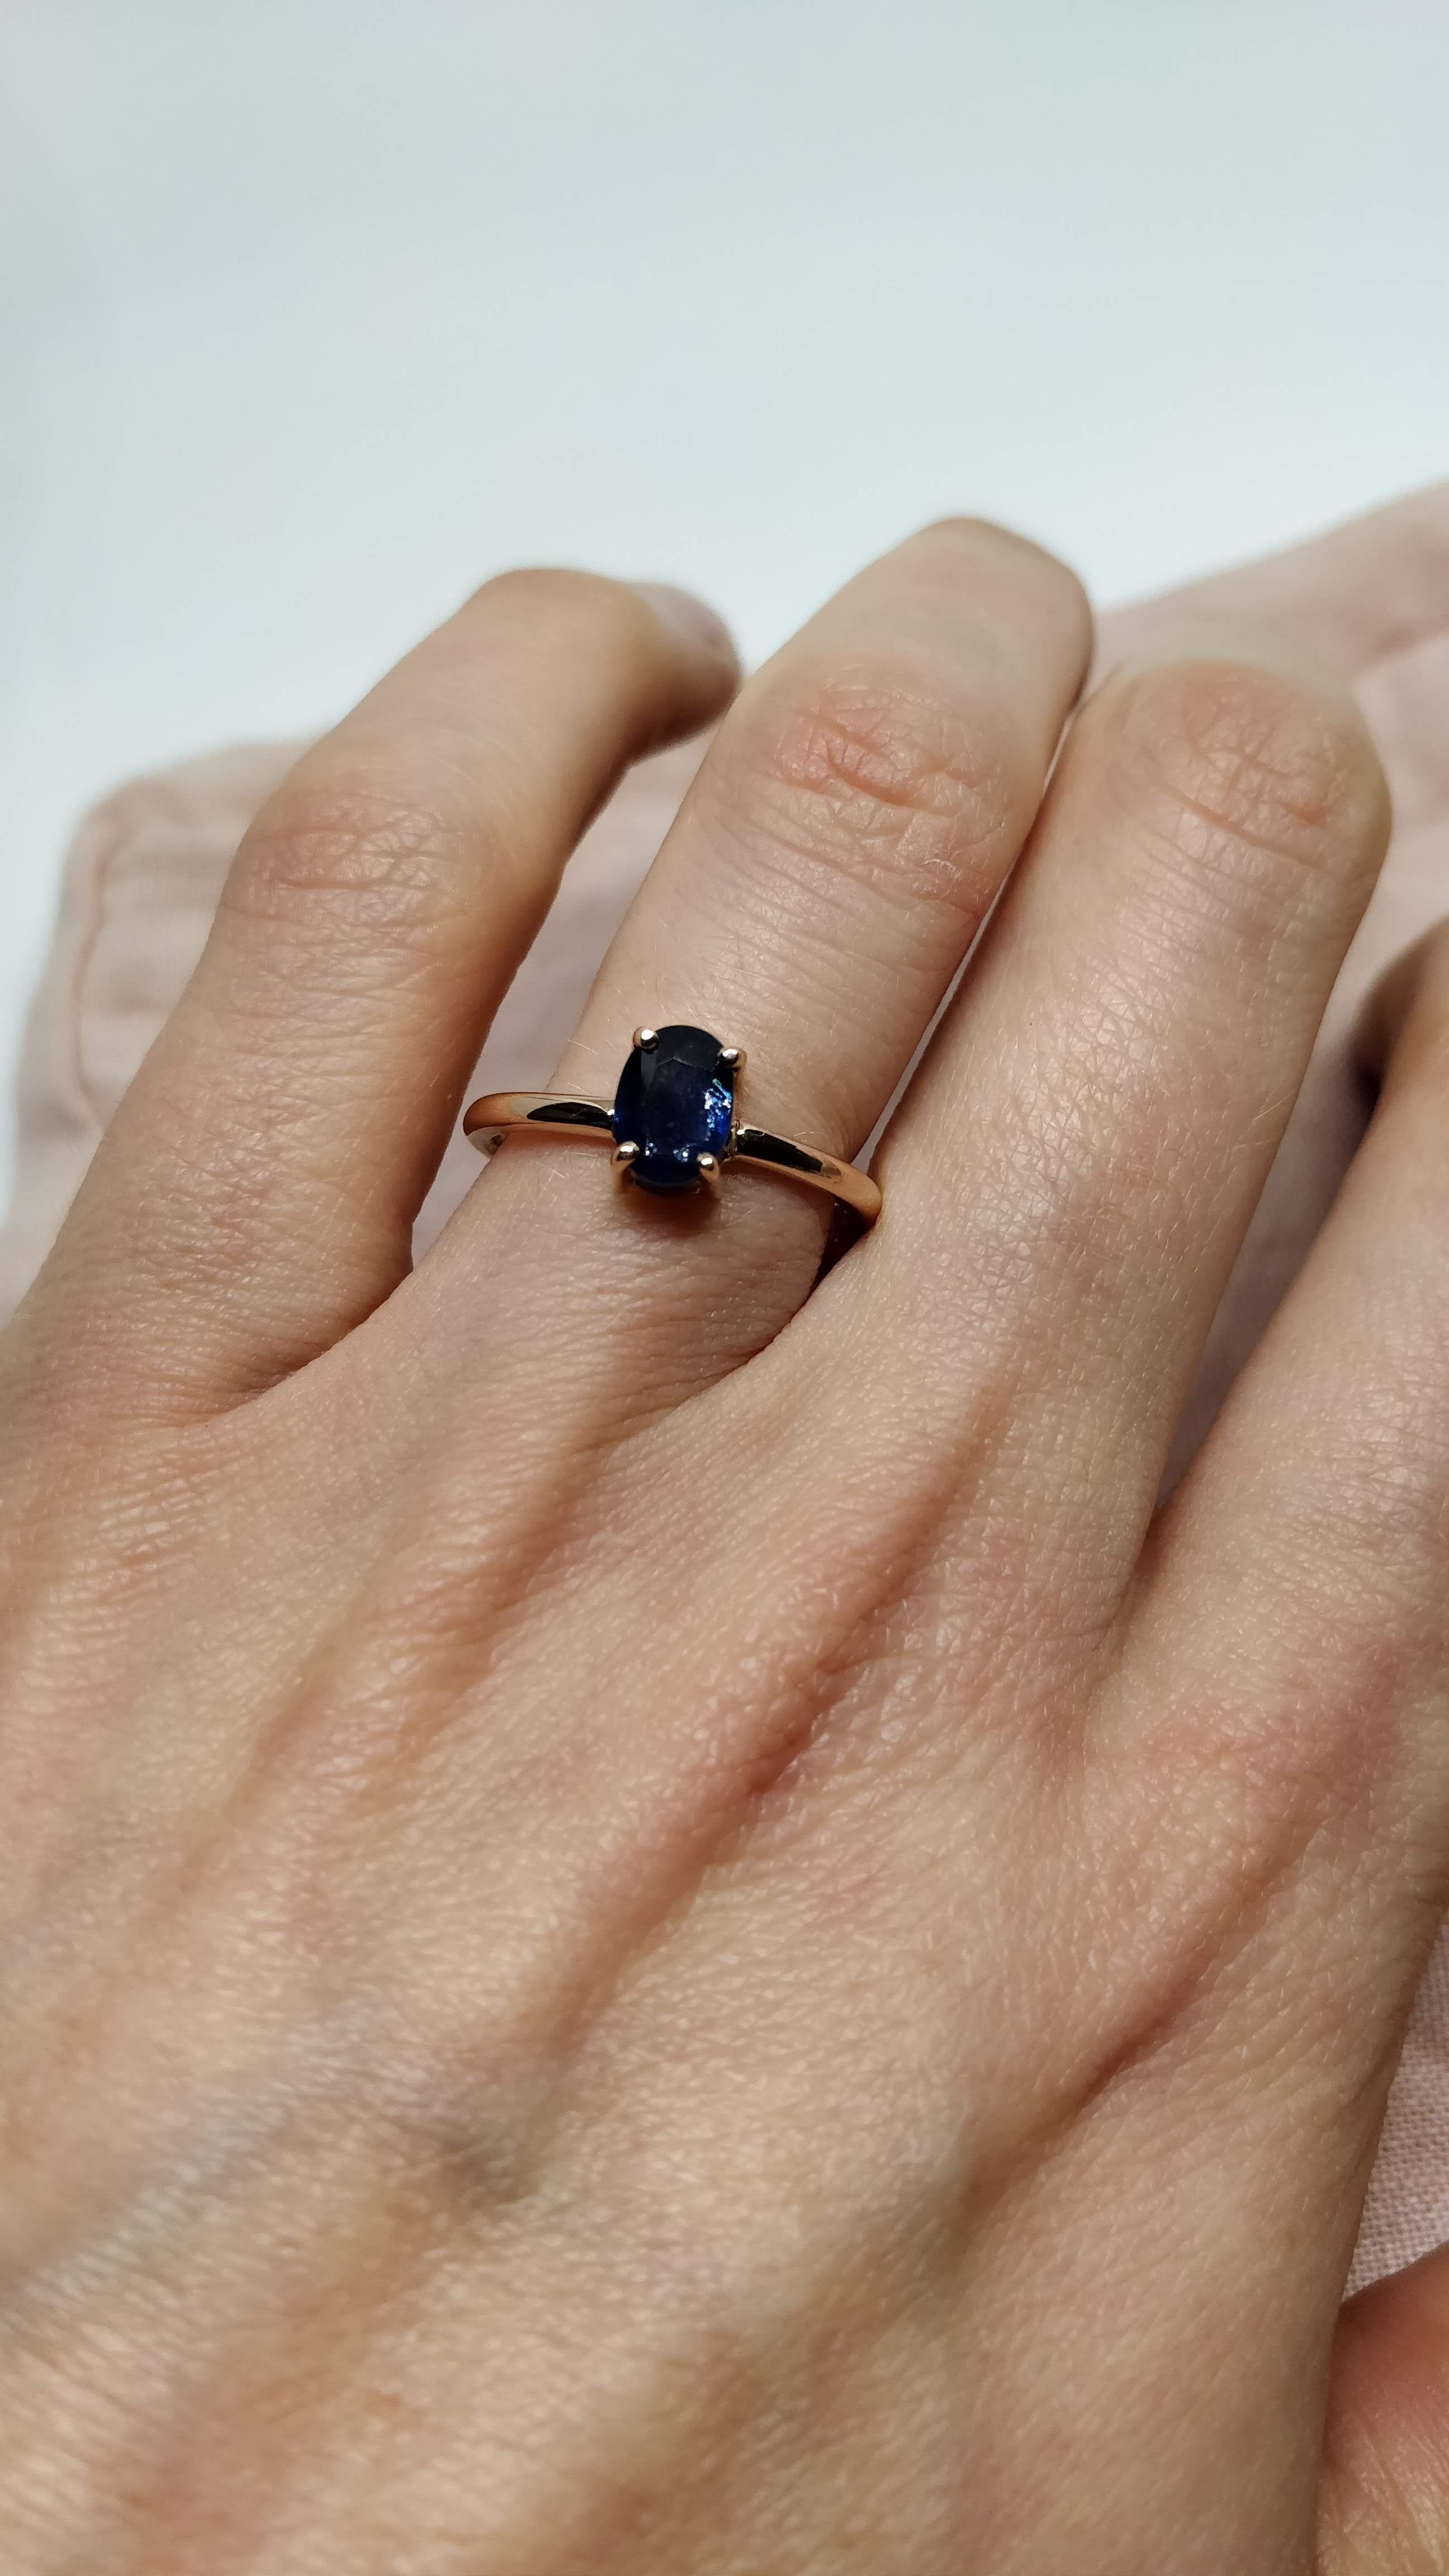 Blue Sapphire Rose Gold Engagement Ring Blue Engagement Ring Sapphire Engagement Ring Blue Flower Diamond Engagement Ring